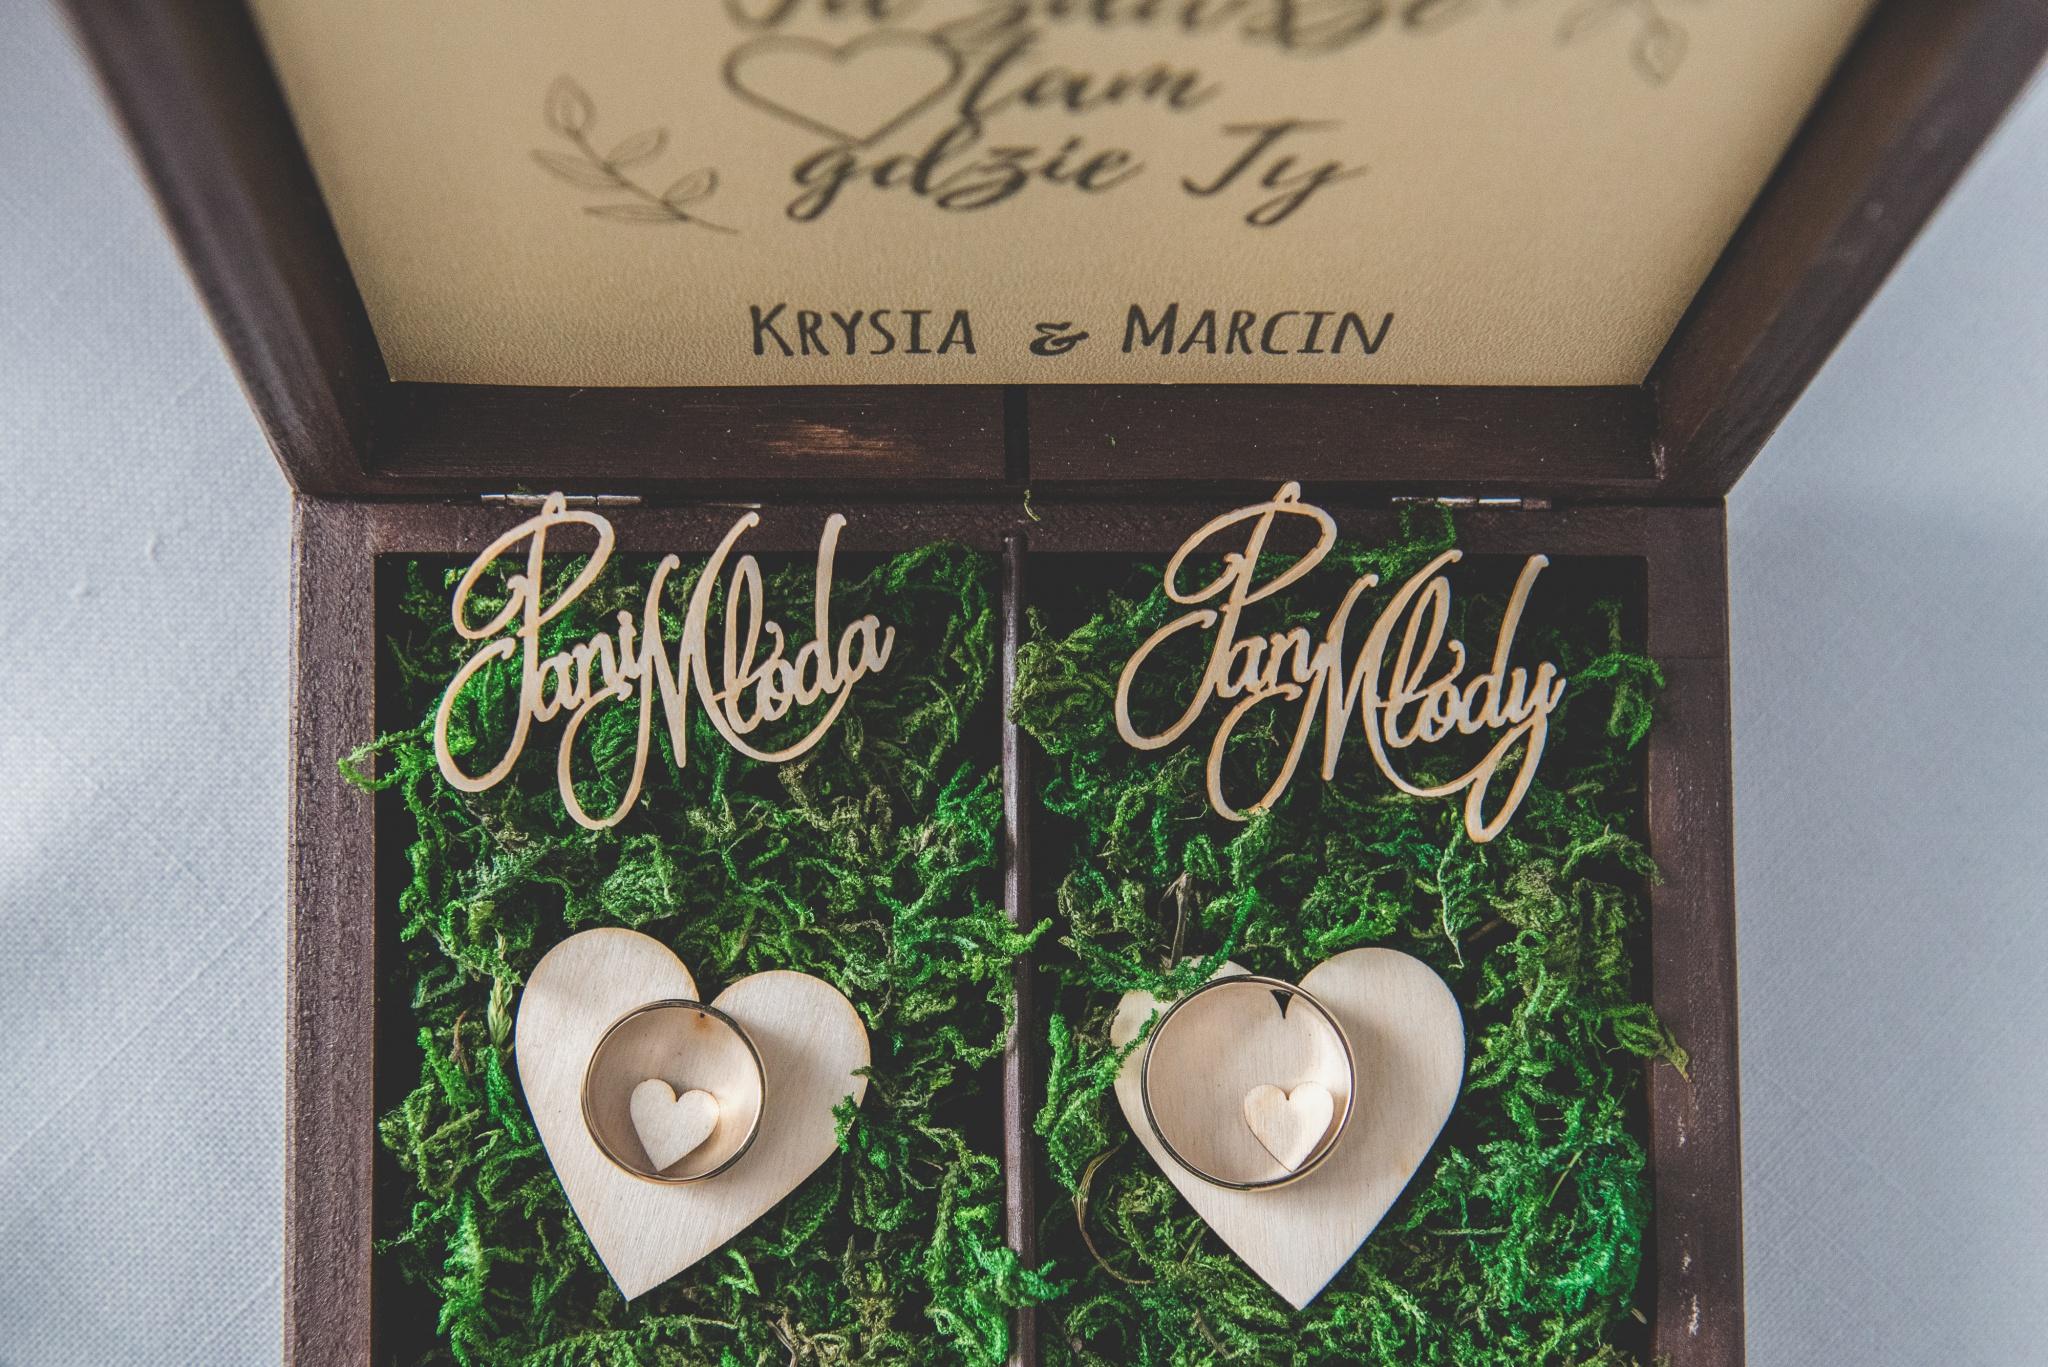 Krysia & Marcin